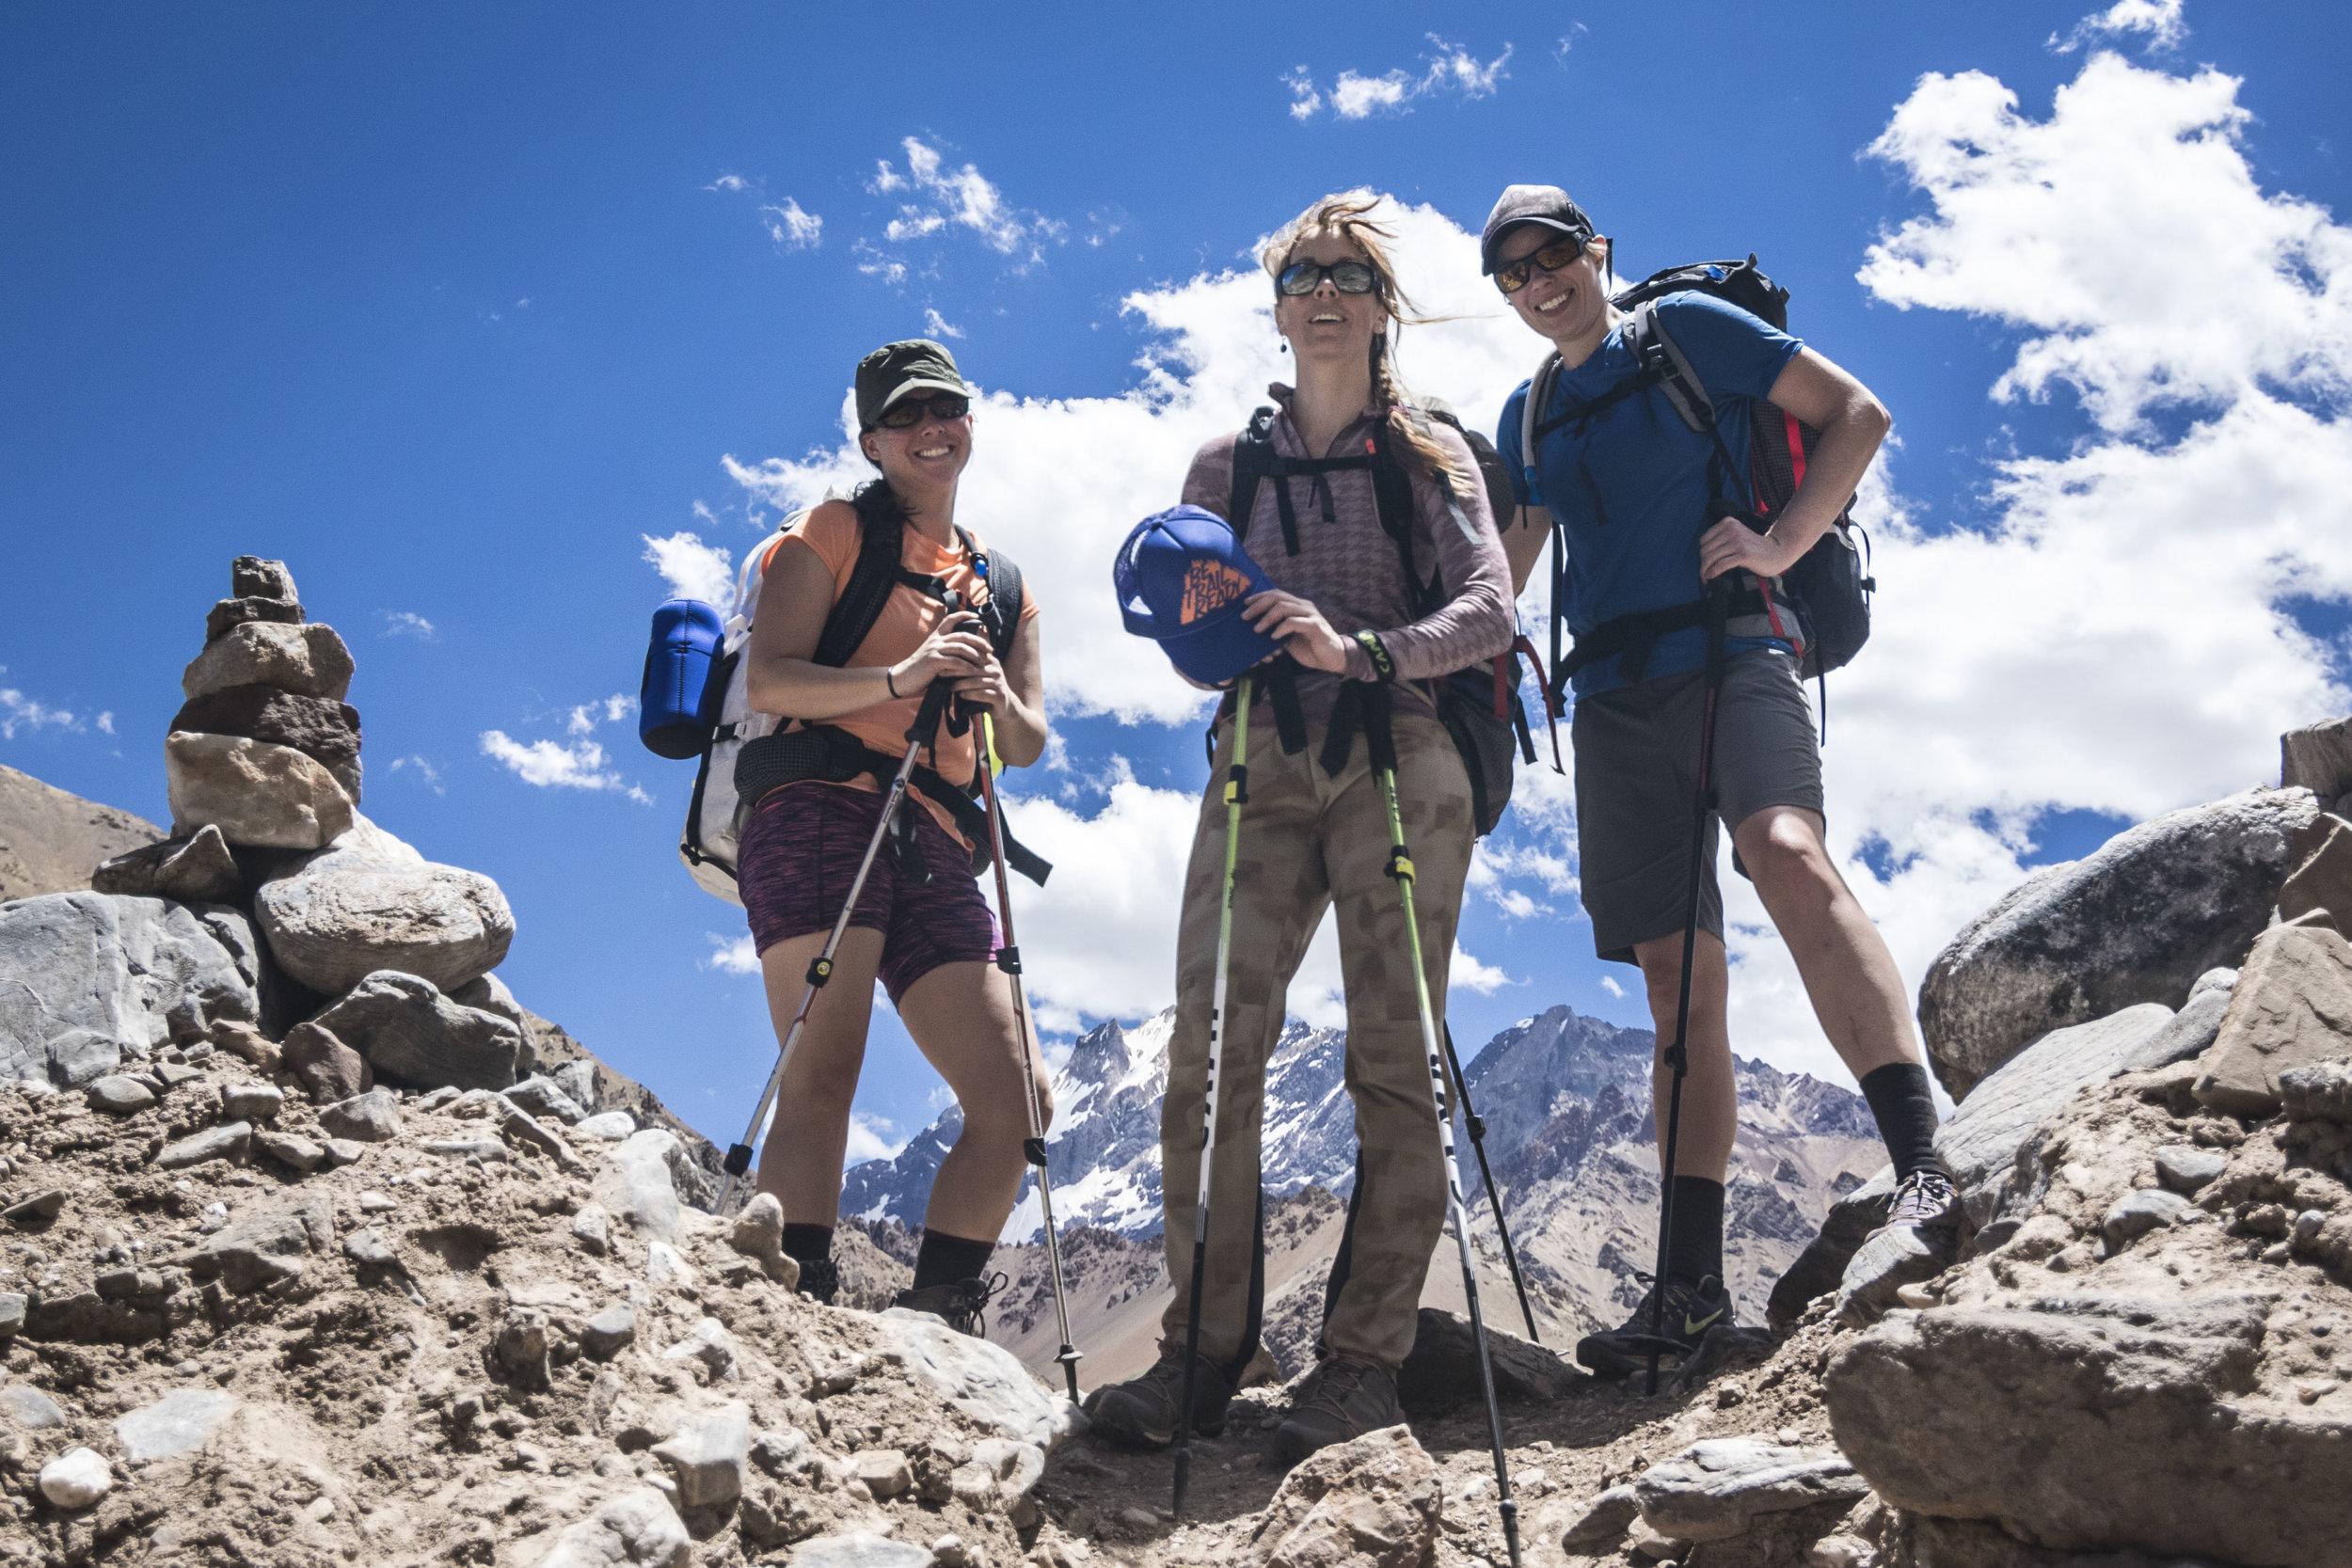 Chicas en Aconcagua - climbing with an all-female team!